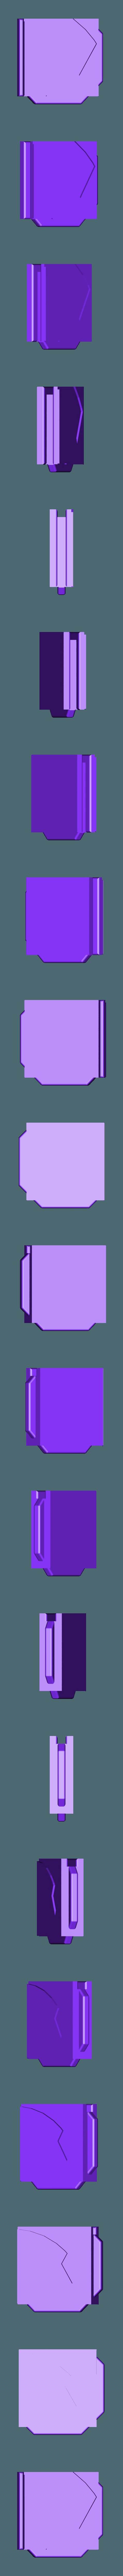 Piece - Part 3.stl Download free STL file Taquin CULTS / Sliding Puzzle • 3D print model, Valelab3D